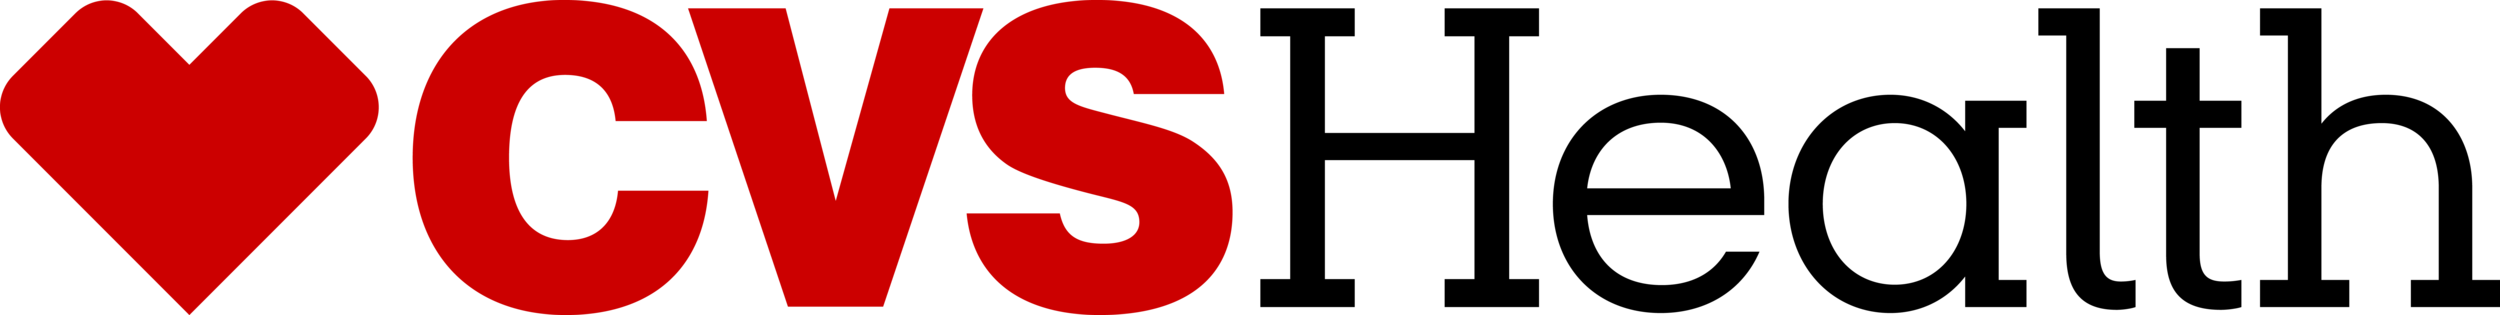 CVS_Health_logo_p_h_rgb_redblk.png